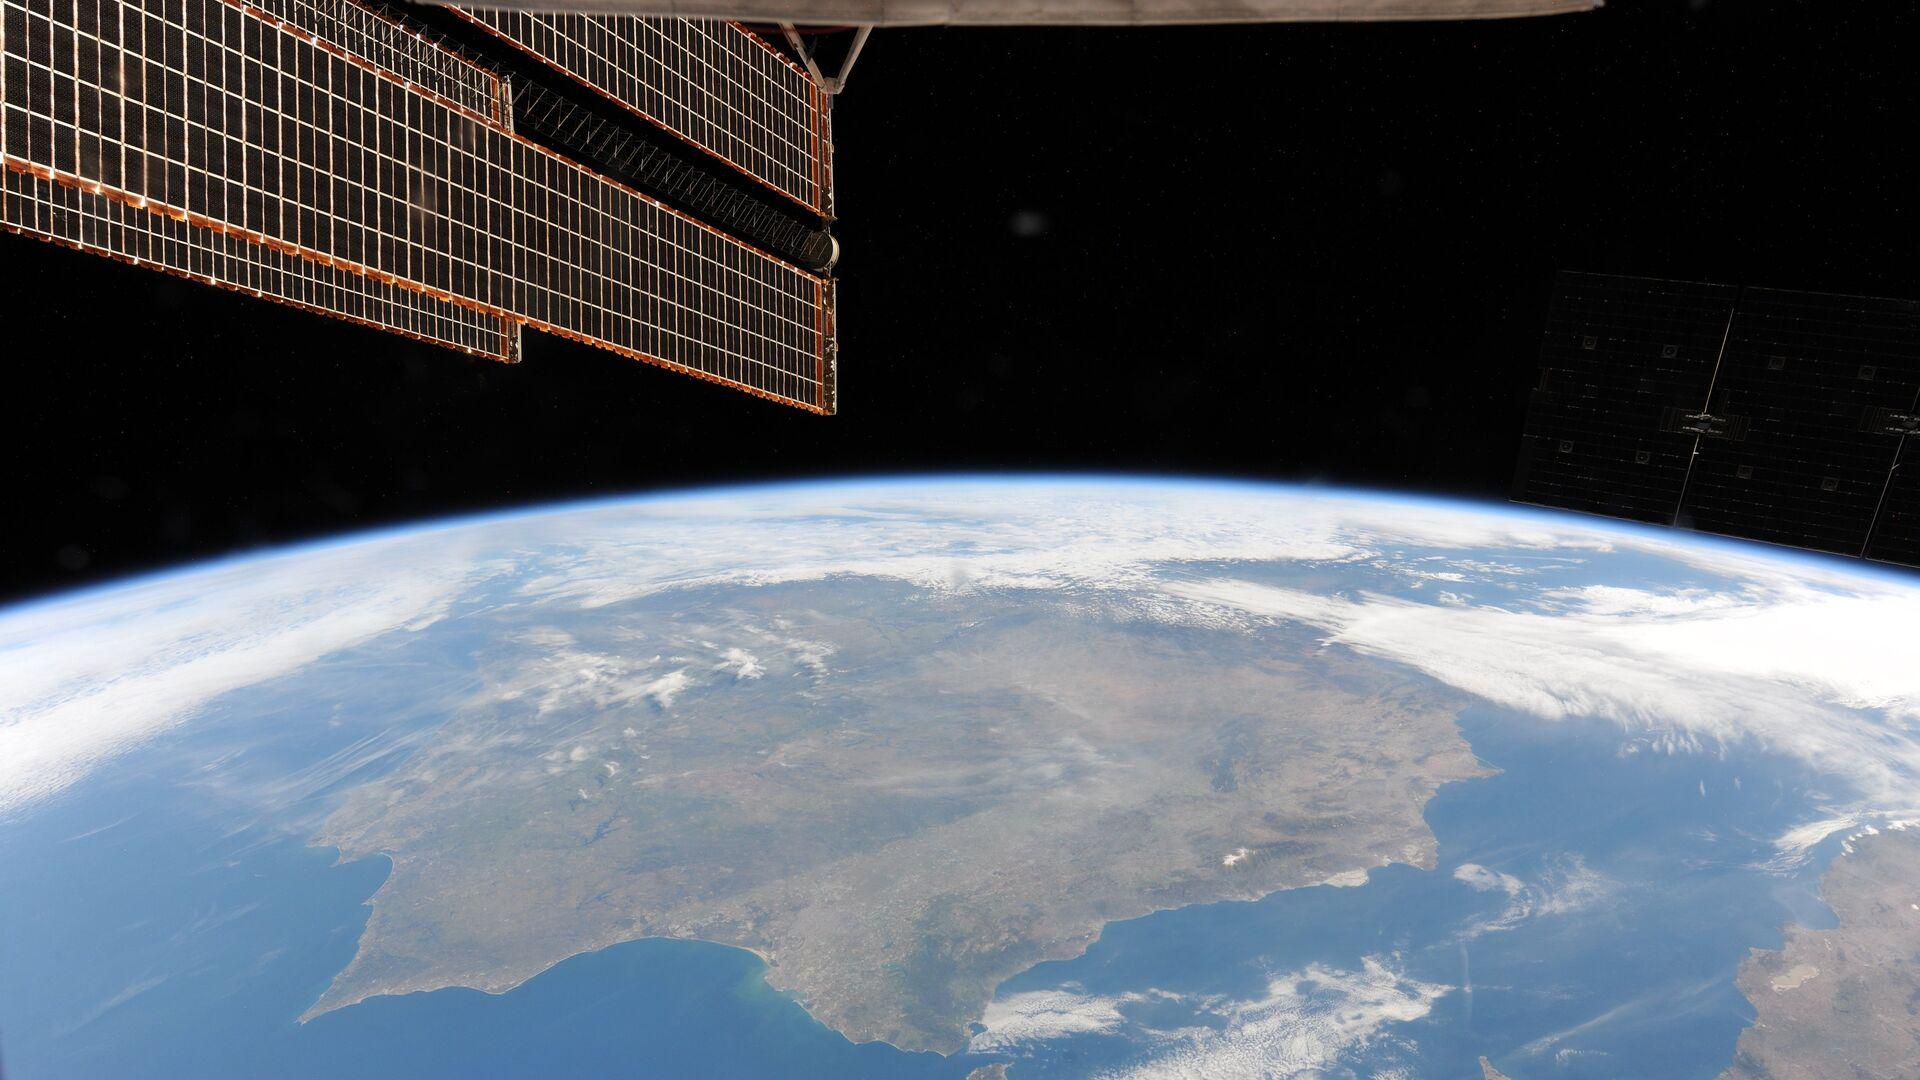 La terra vista dallo spazio - Sputnik Italia, 1920, 27.02.2021